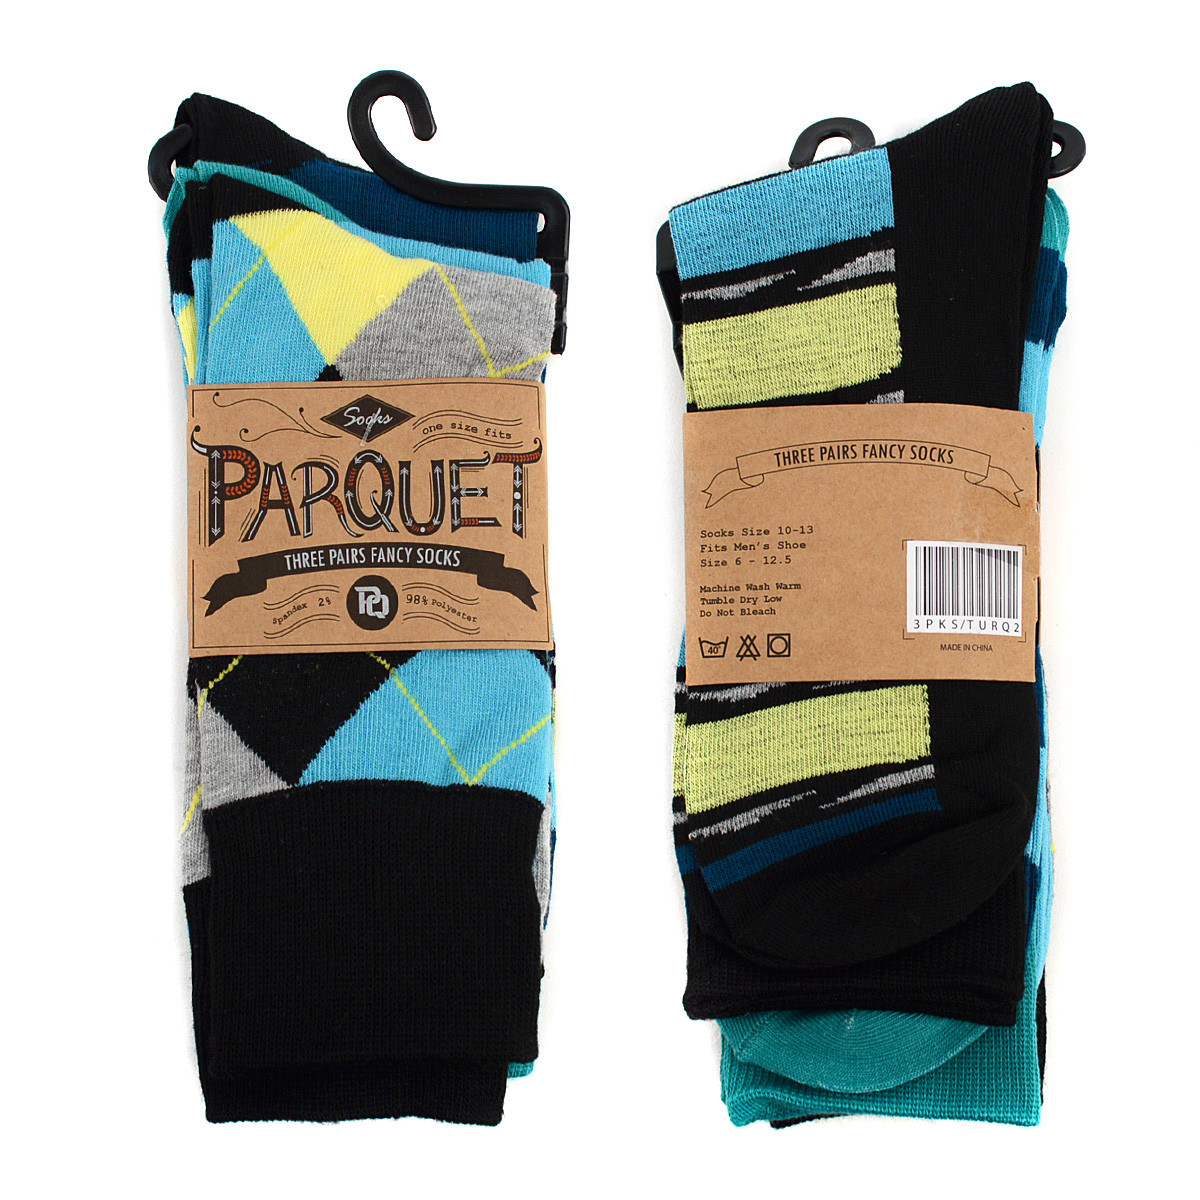 Assorted Pack (3 Pairs) Men's Turquoise Casual Fancy Socks 3PKS/TURQ2